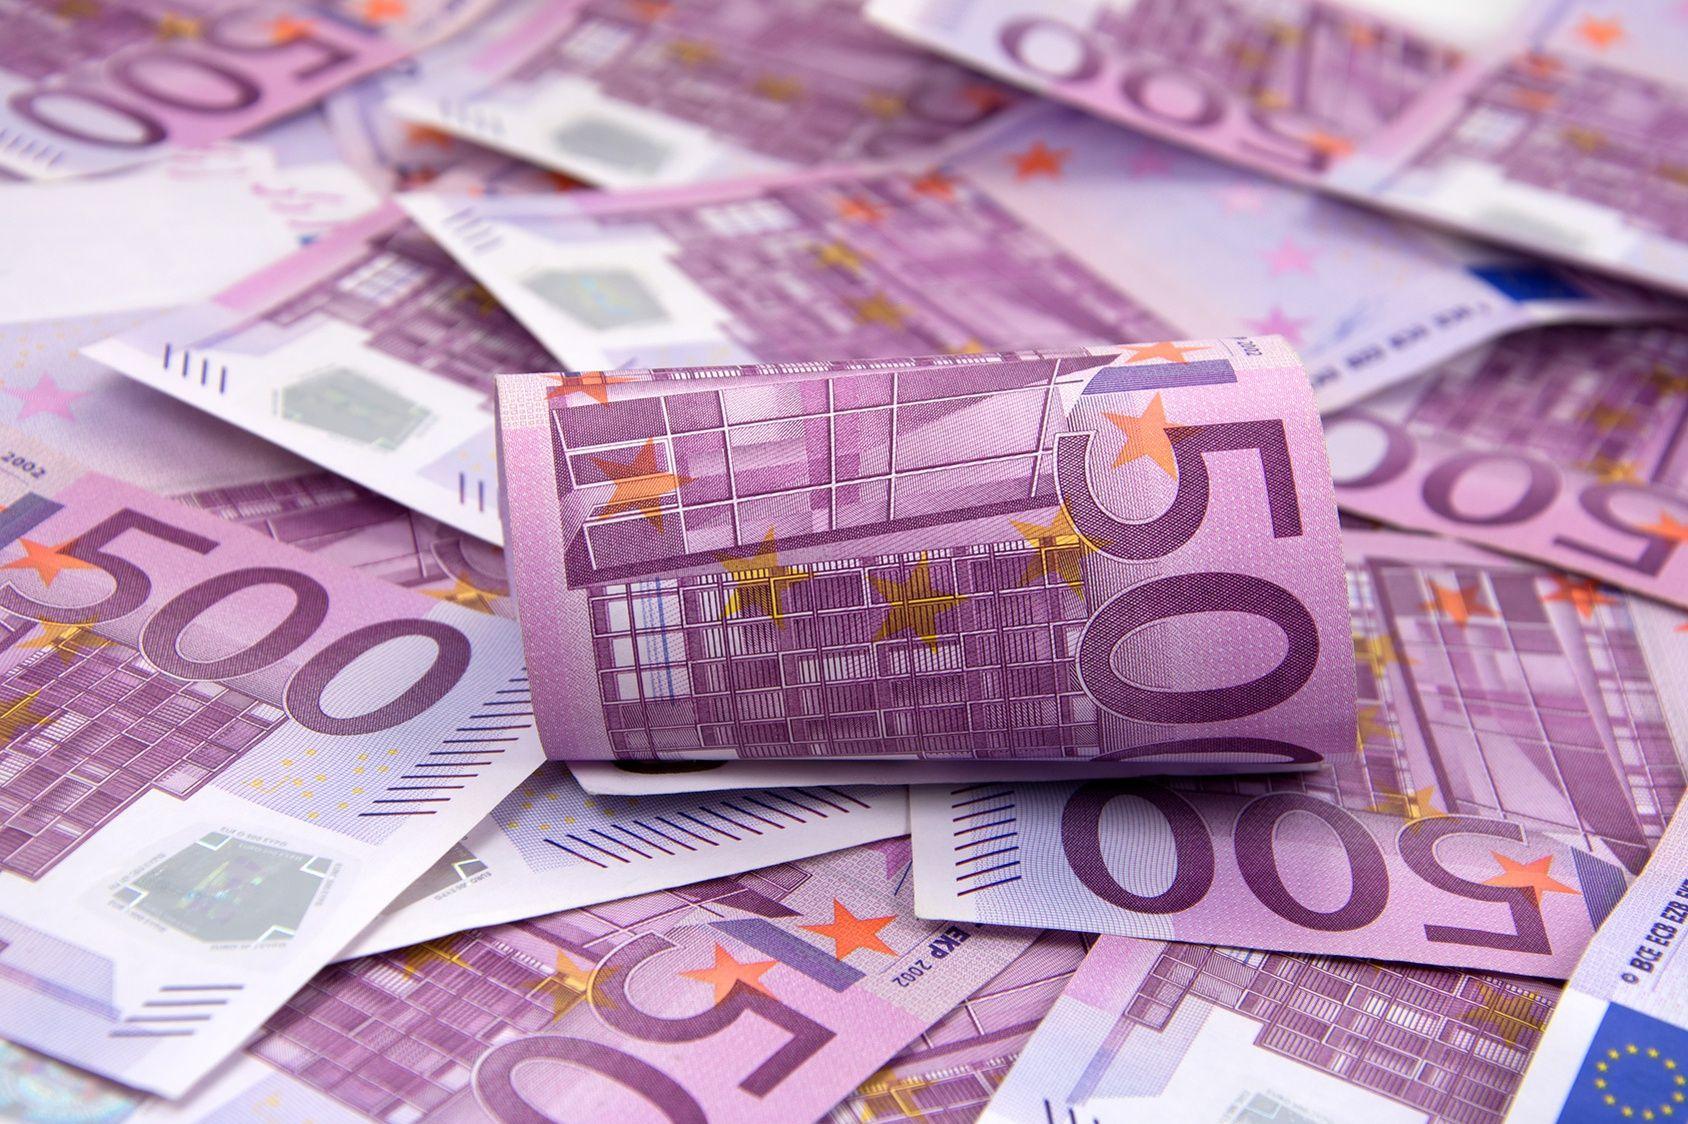 La Bce Va Cesser D'imprimer Les Billets De 500 Euros Fin 2018 à Billet De 100 Euros À Imprimer